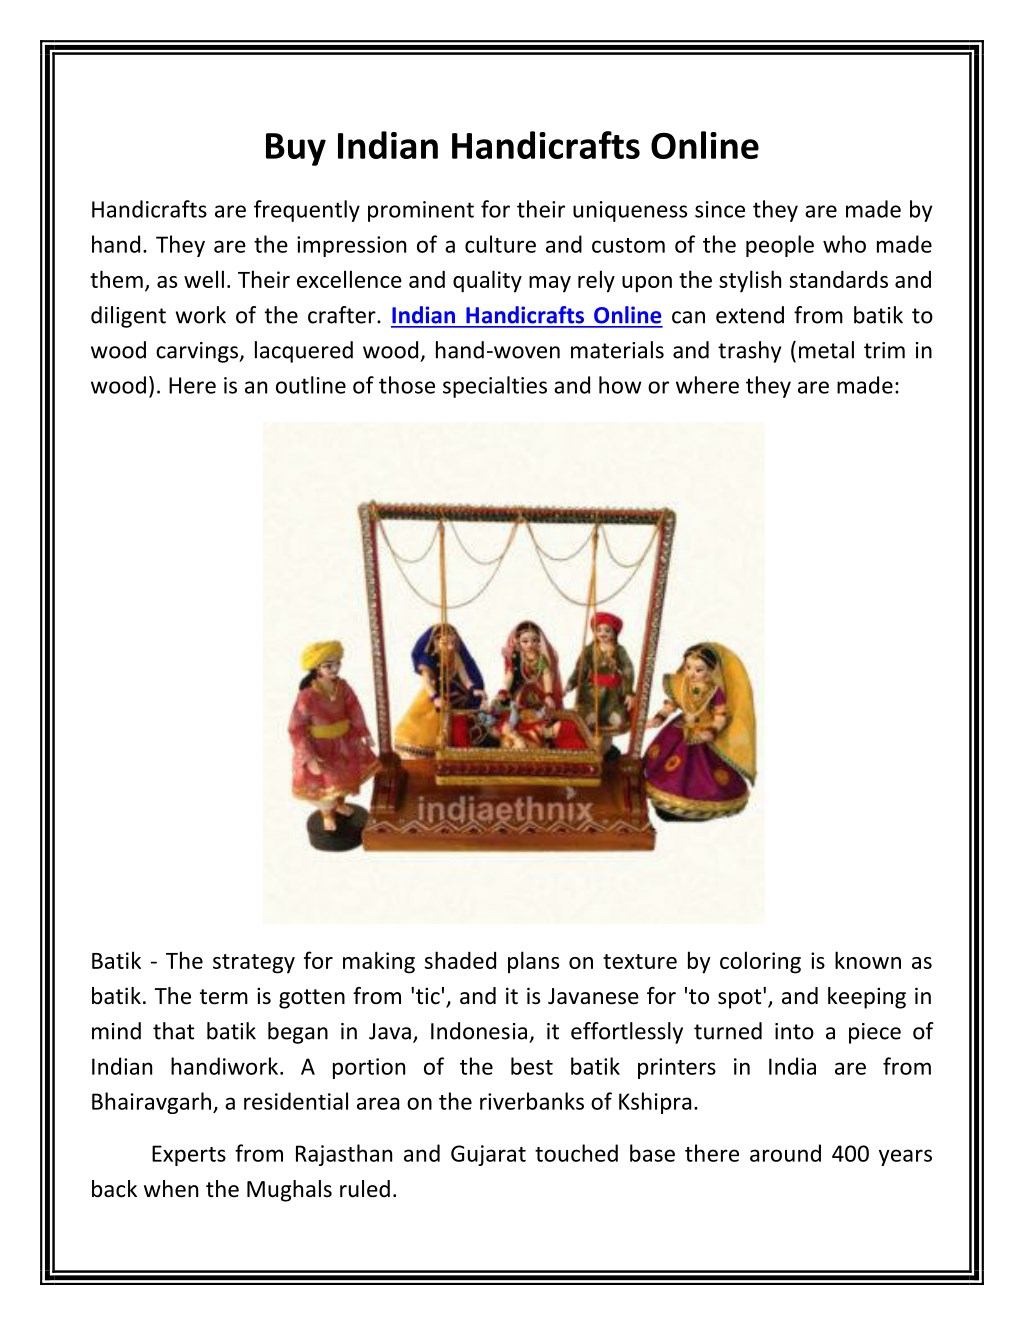 Ppt Buy Indian Handicrafts Online Powerpoint Presentation Id 7667169